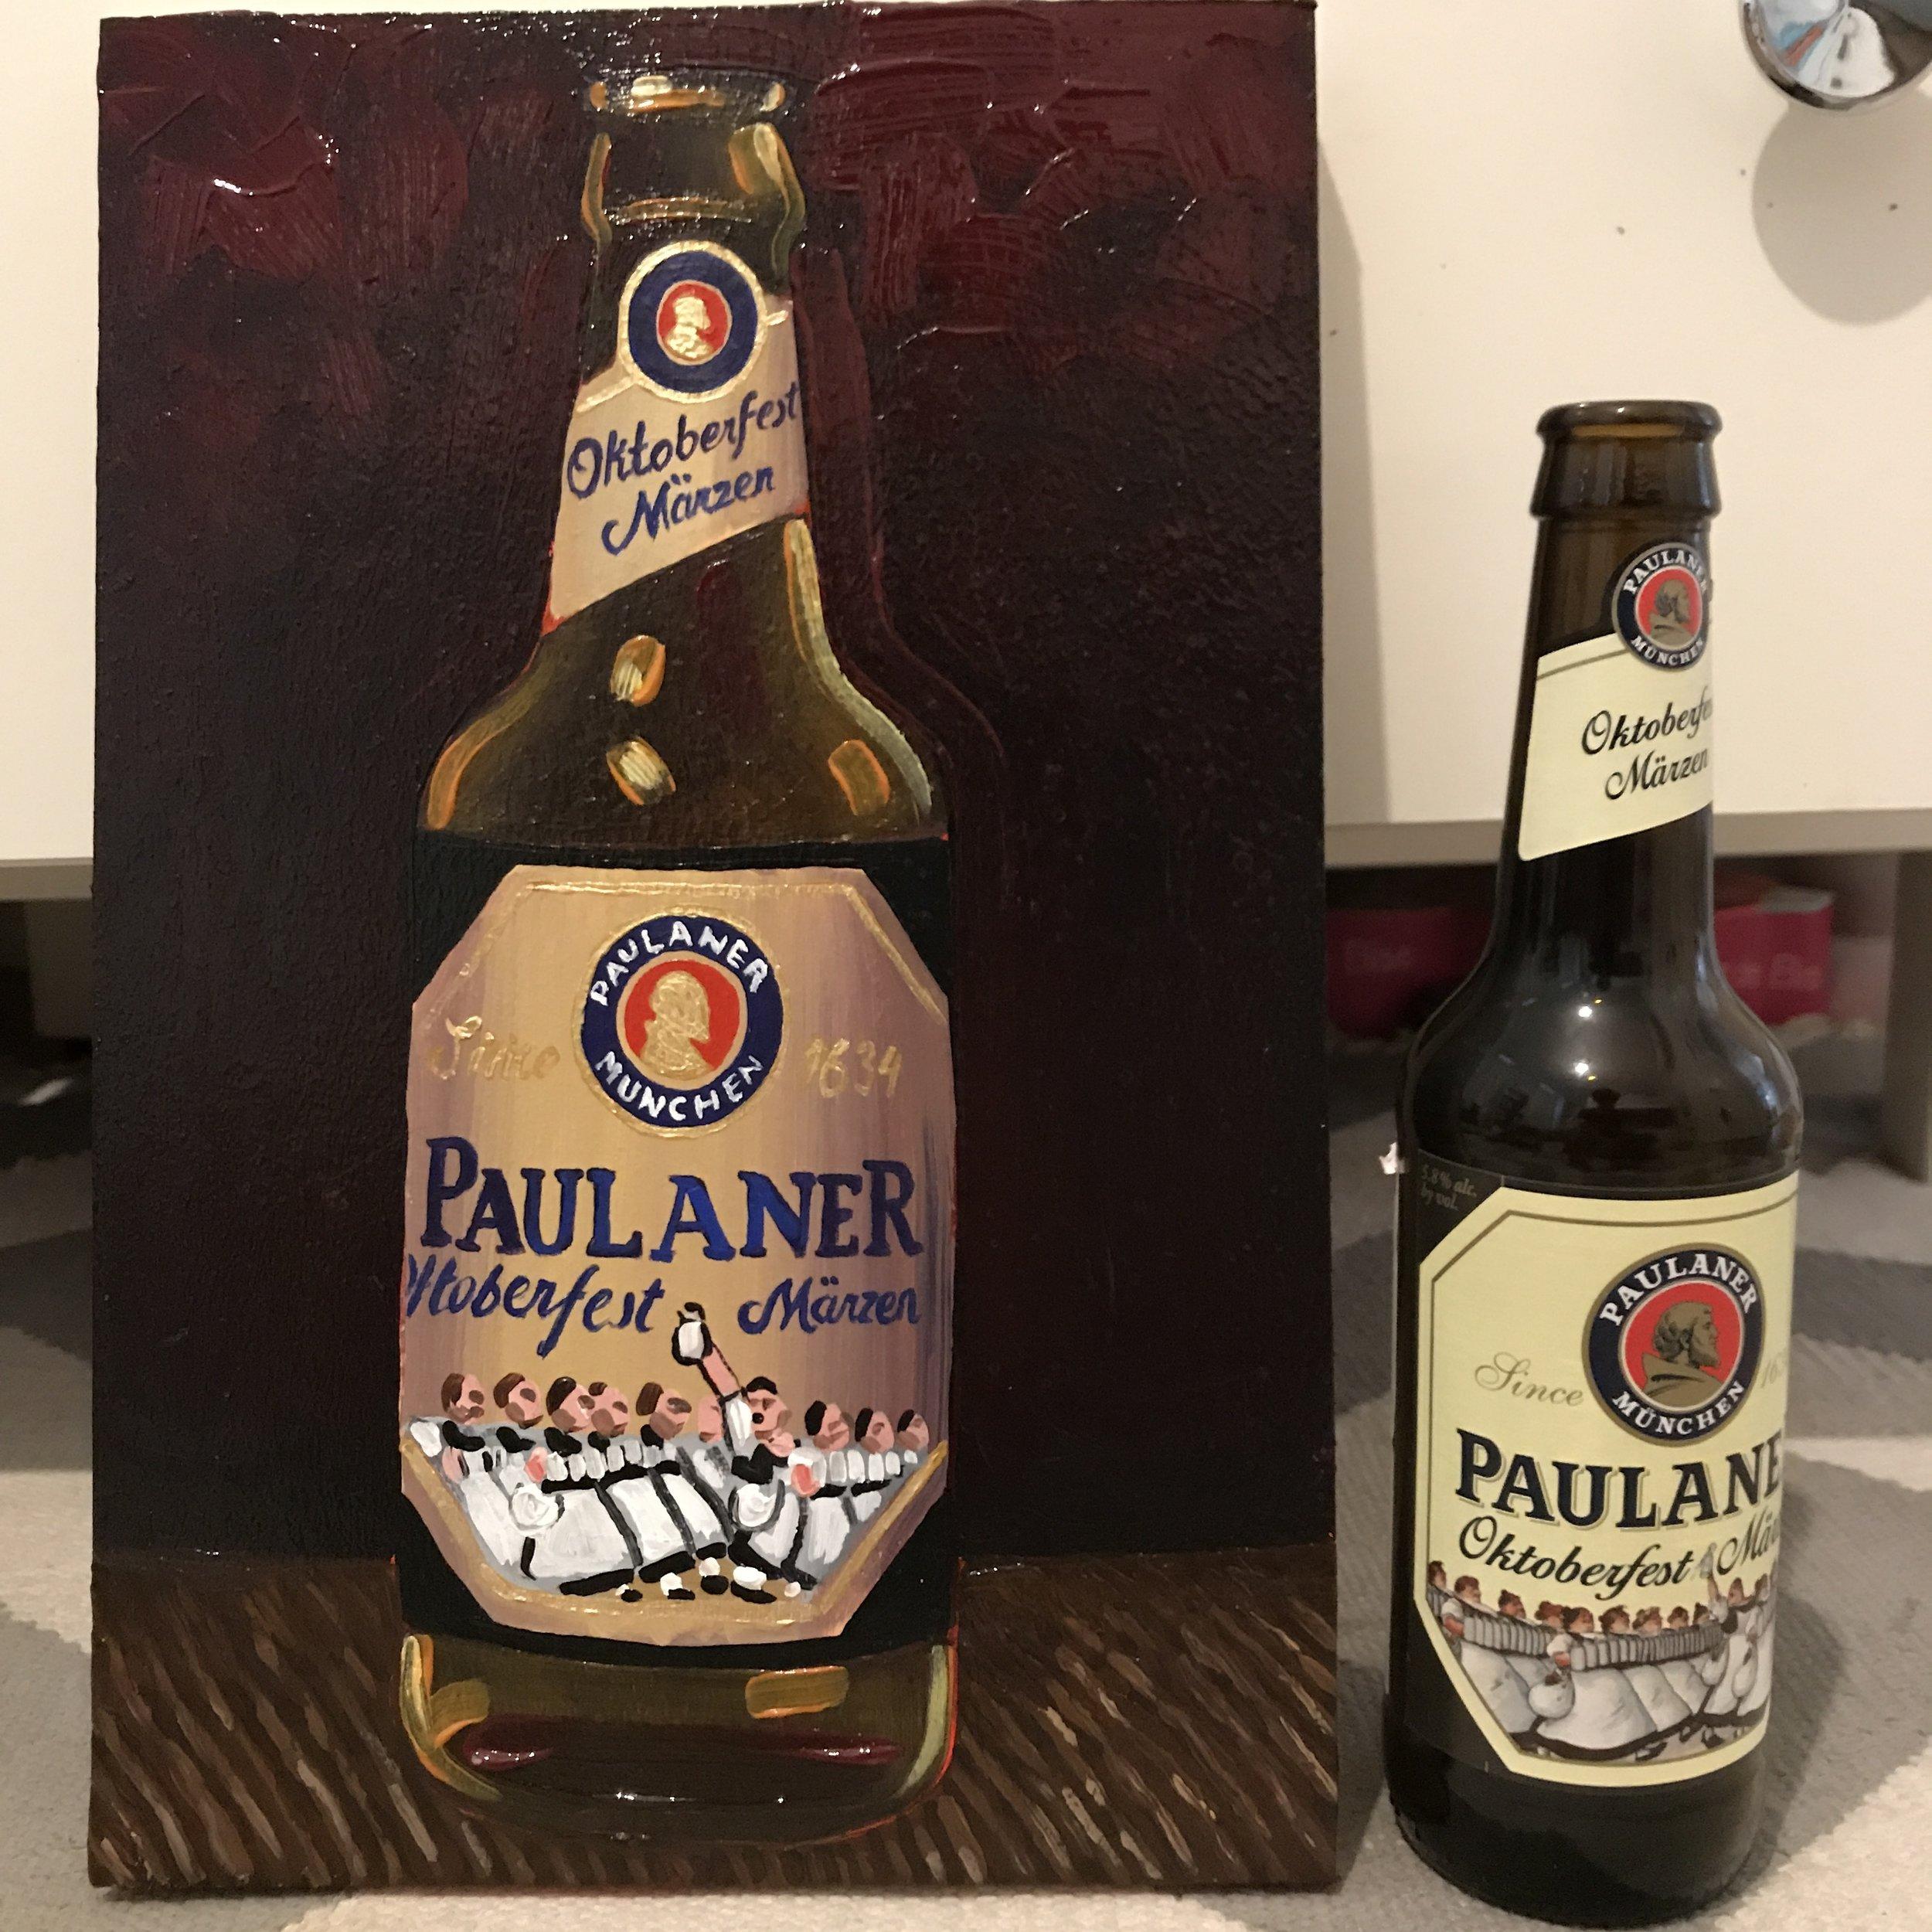 34 Paulaner Oktoberfest-Märzen (Germany)